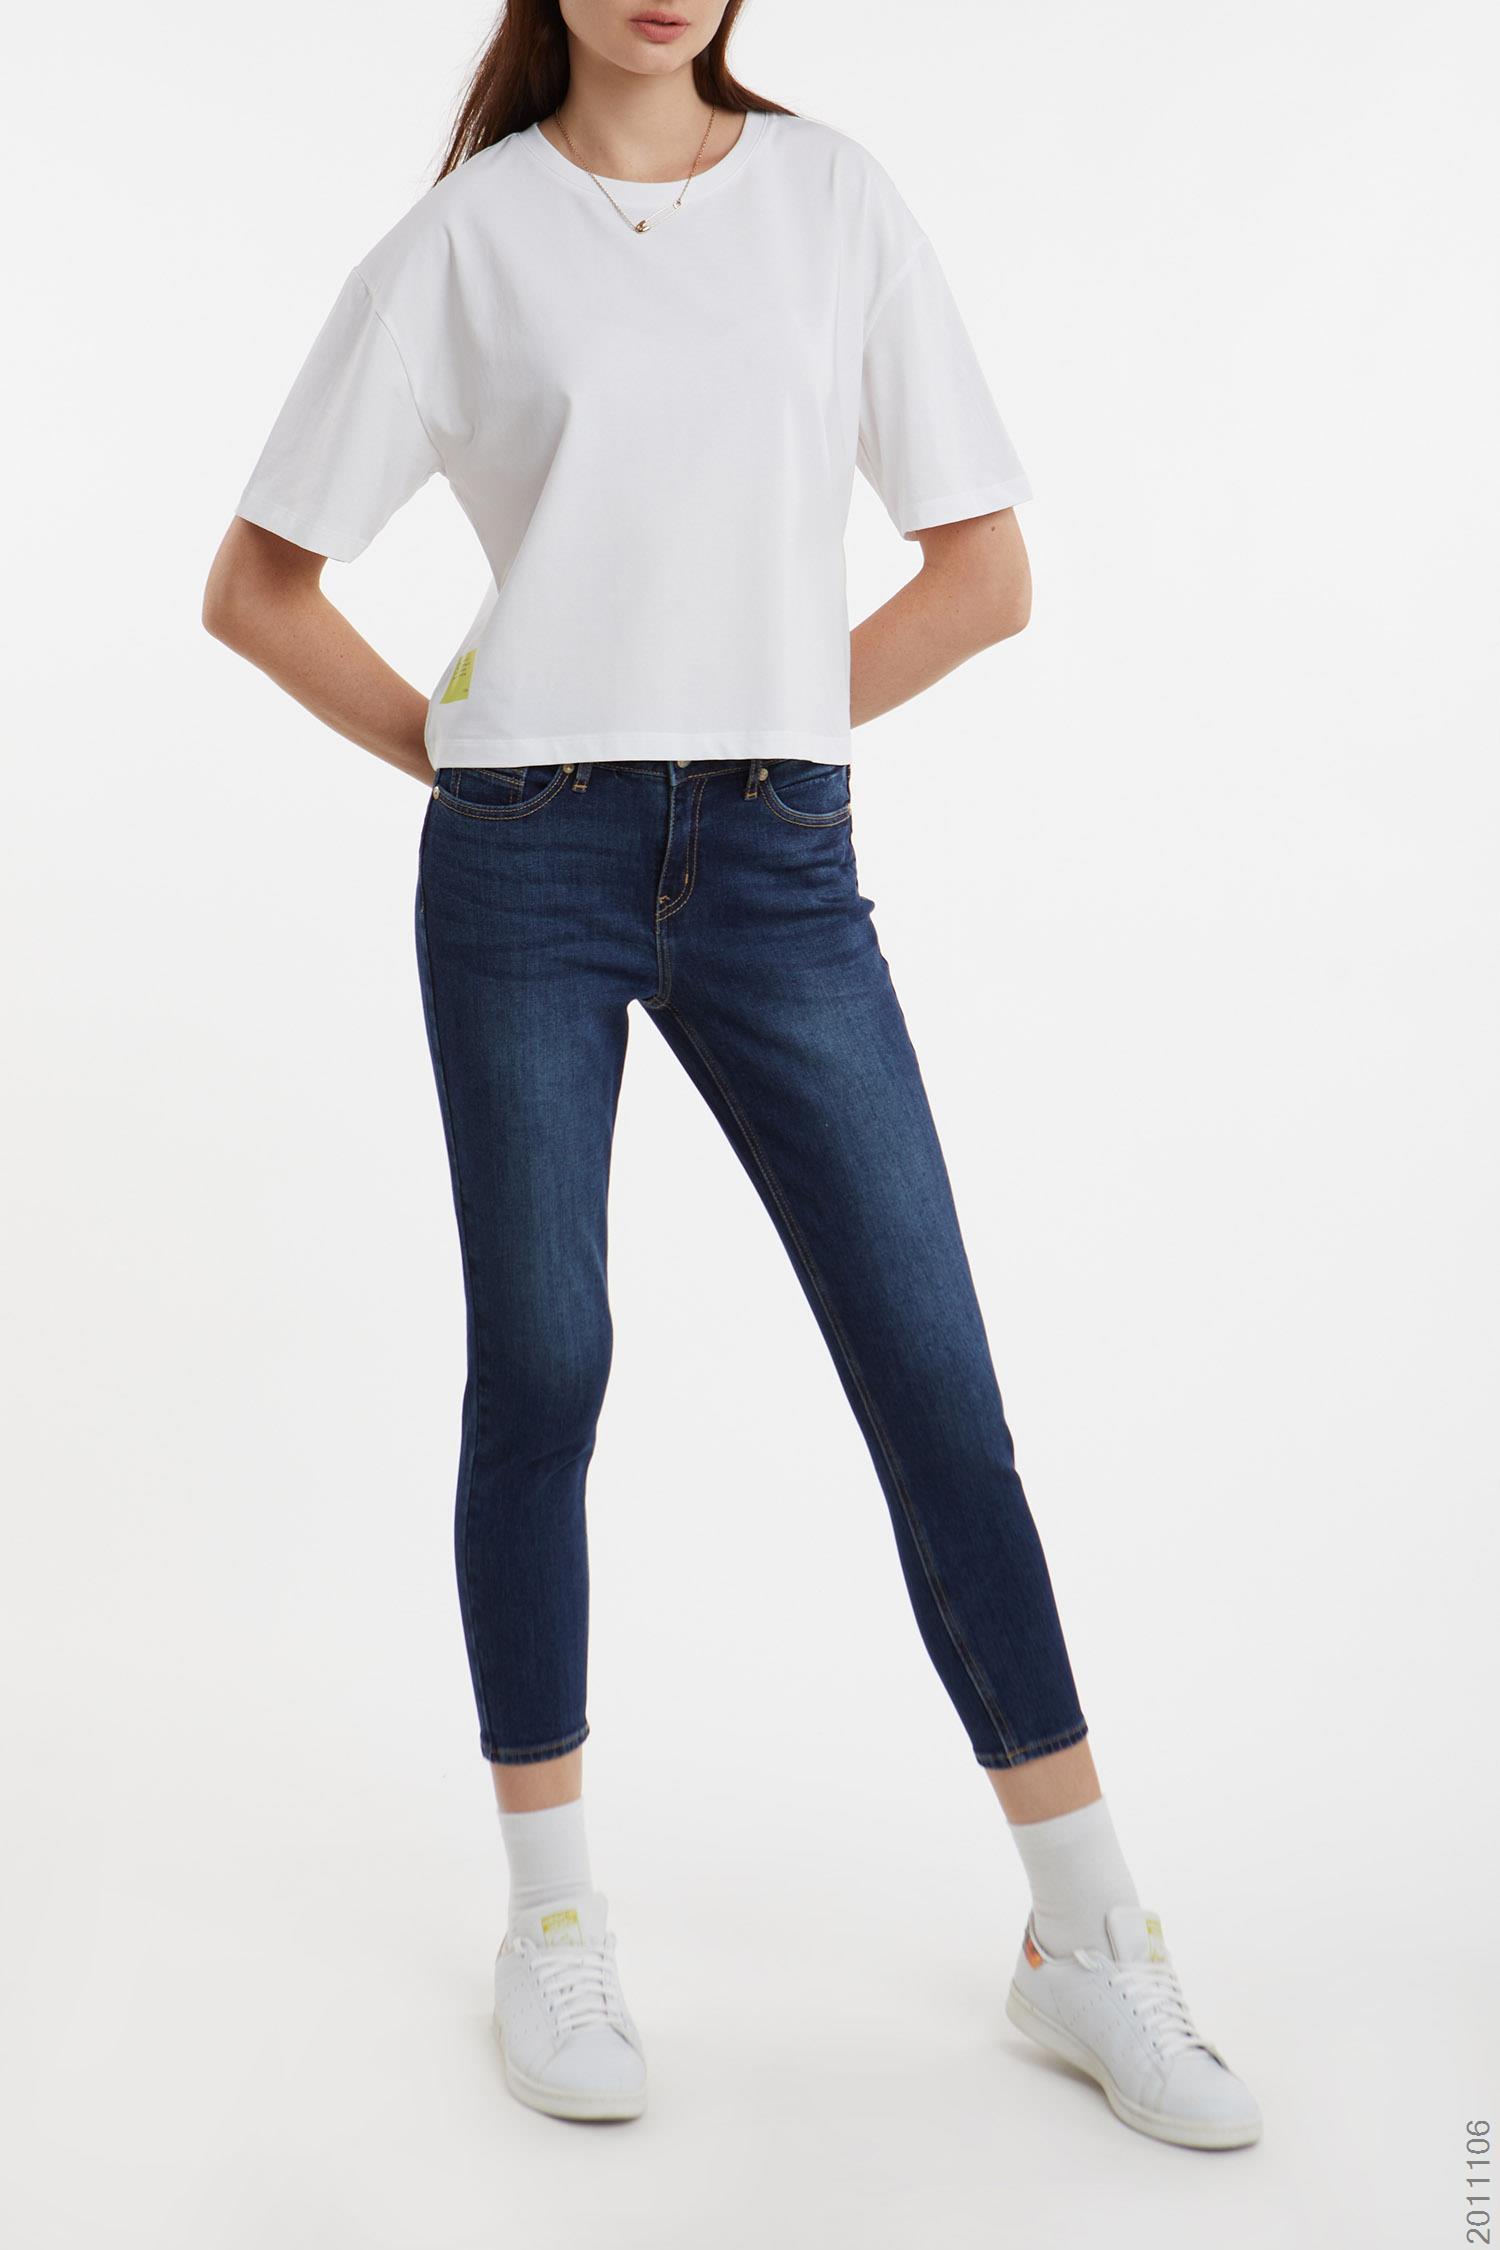 quần jean nữ - 2011106